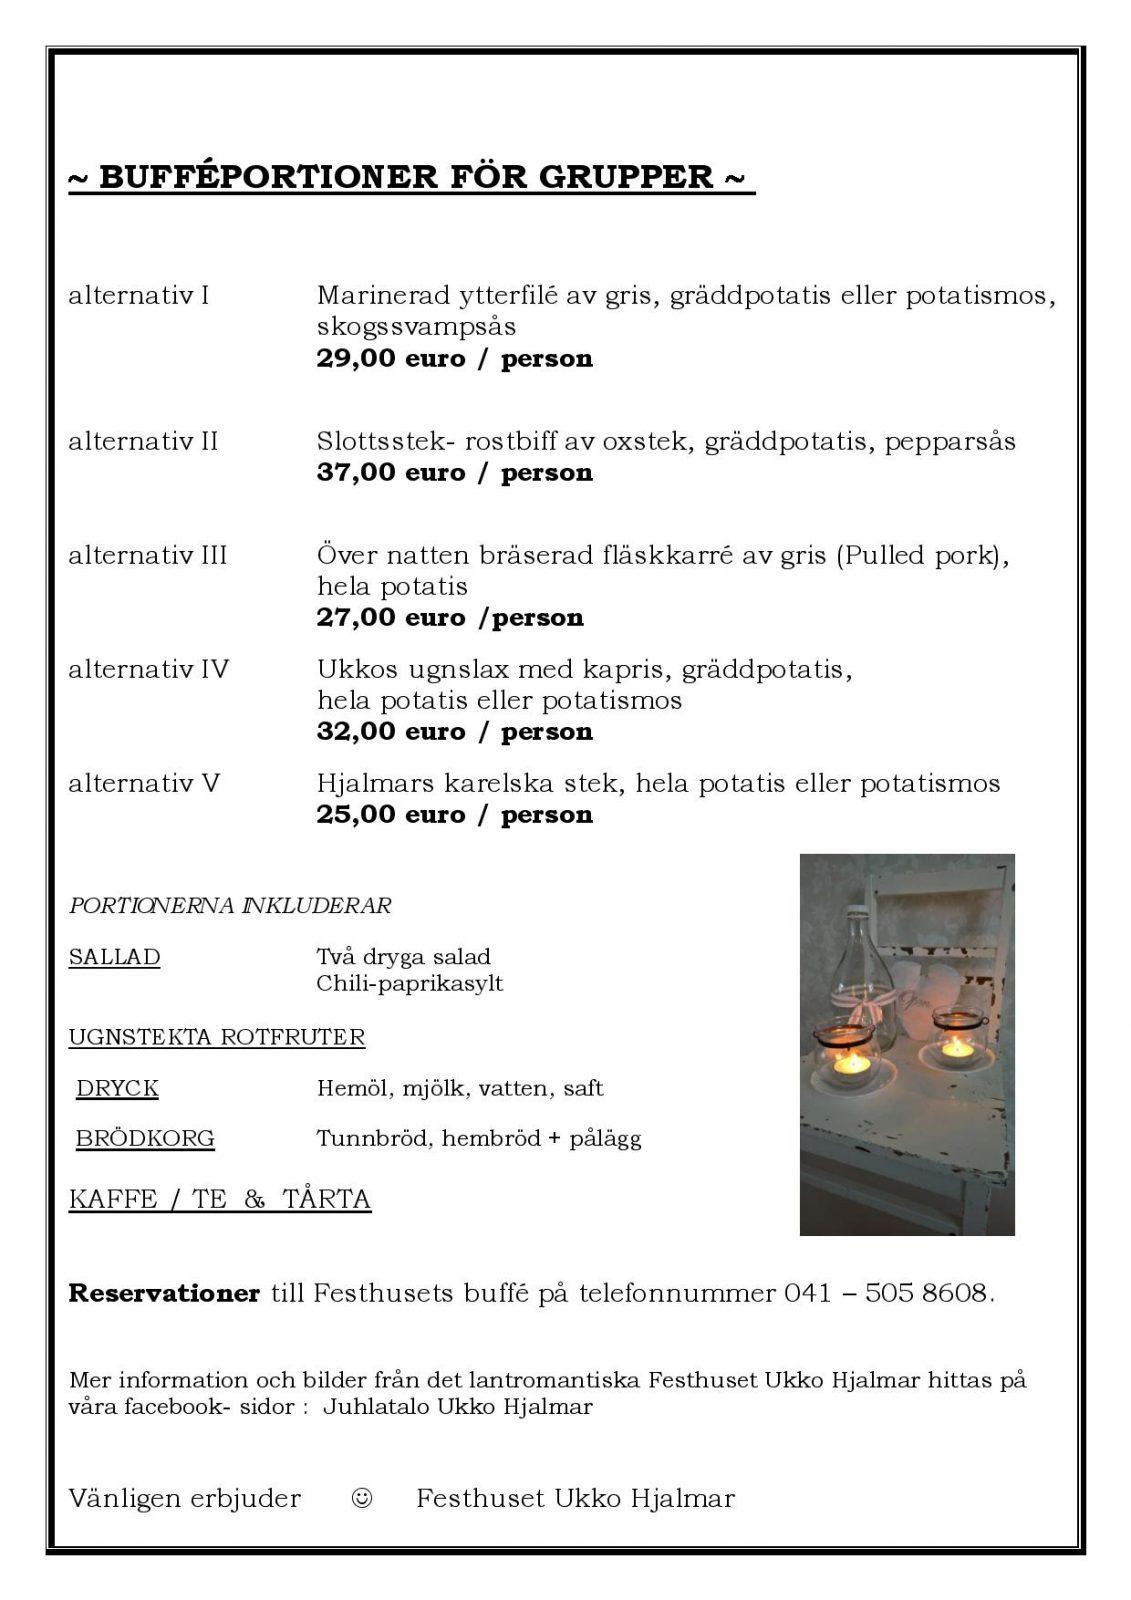 julbordobuffeforgrupper-page-003